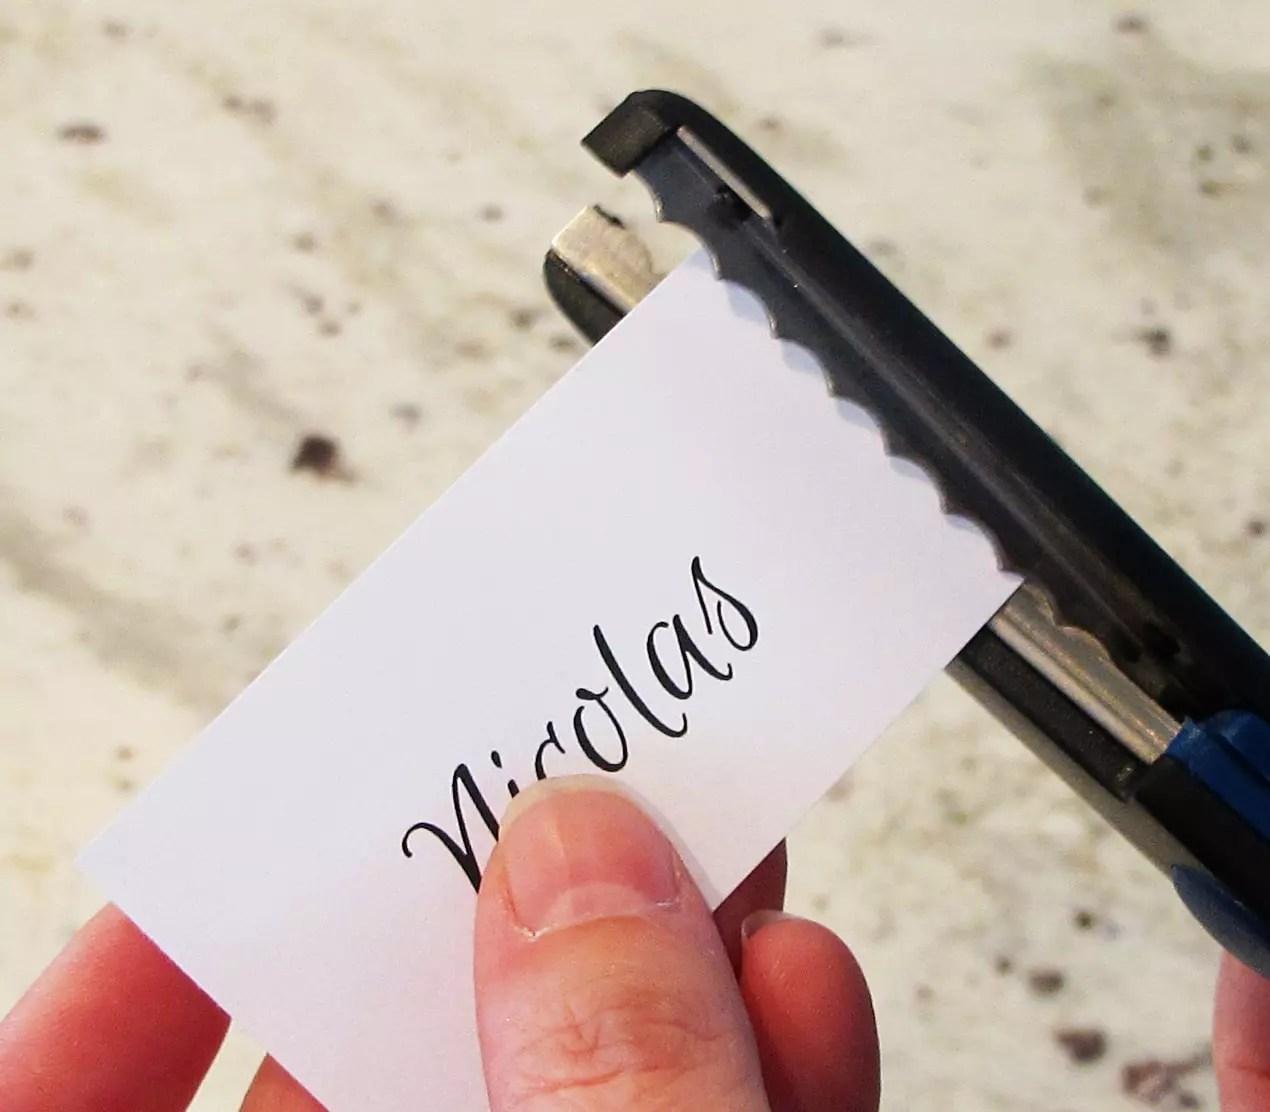 trimming paper with decorative scissors